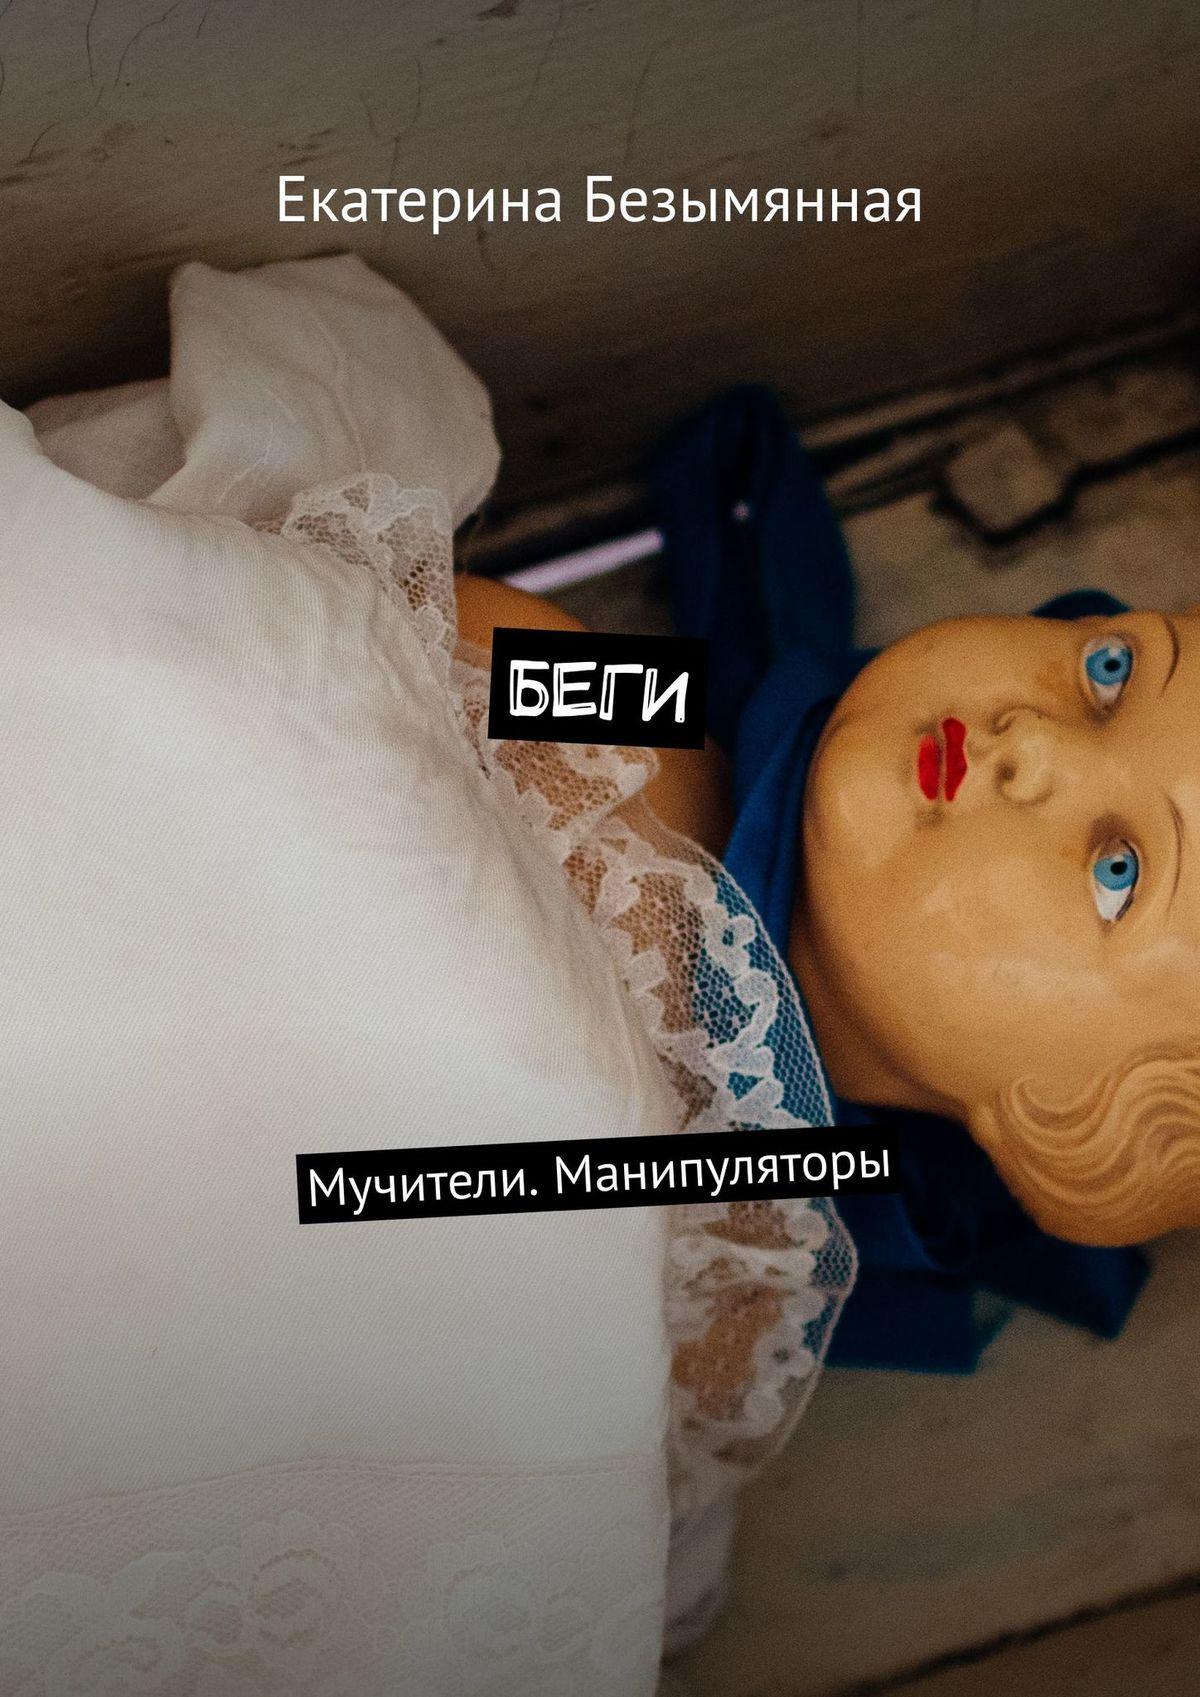 Екатерина Сергеевна Безымянная Беги. Мучители. Манипуляторы манипуляторы